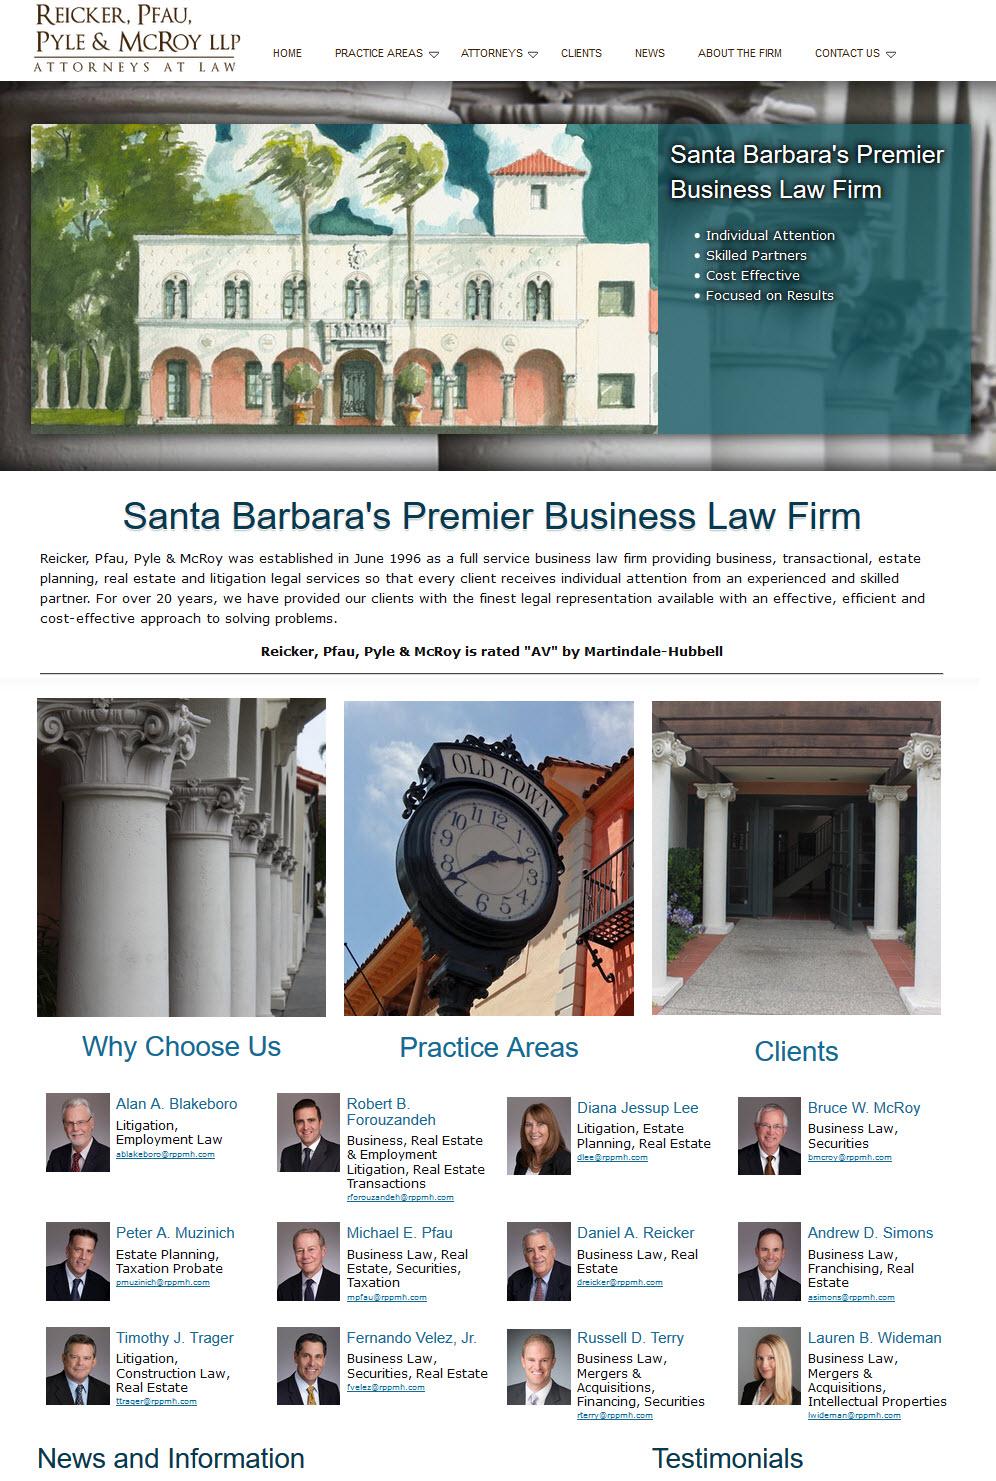 Santa Barbara Premier Attorneys - Reicker, Pfau, Pyle & McRoy